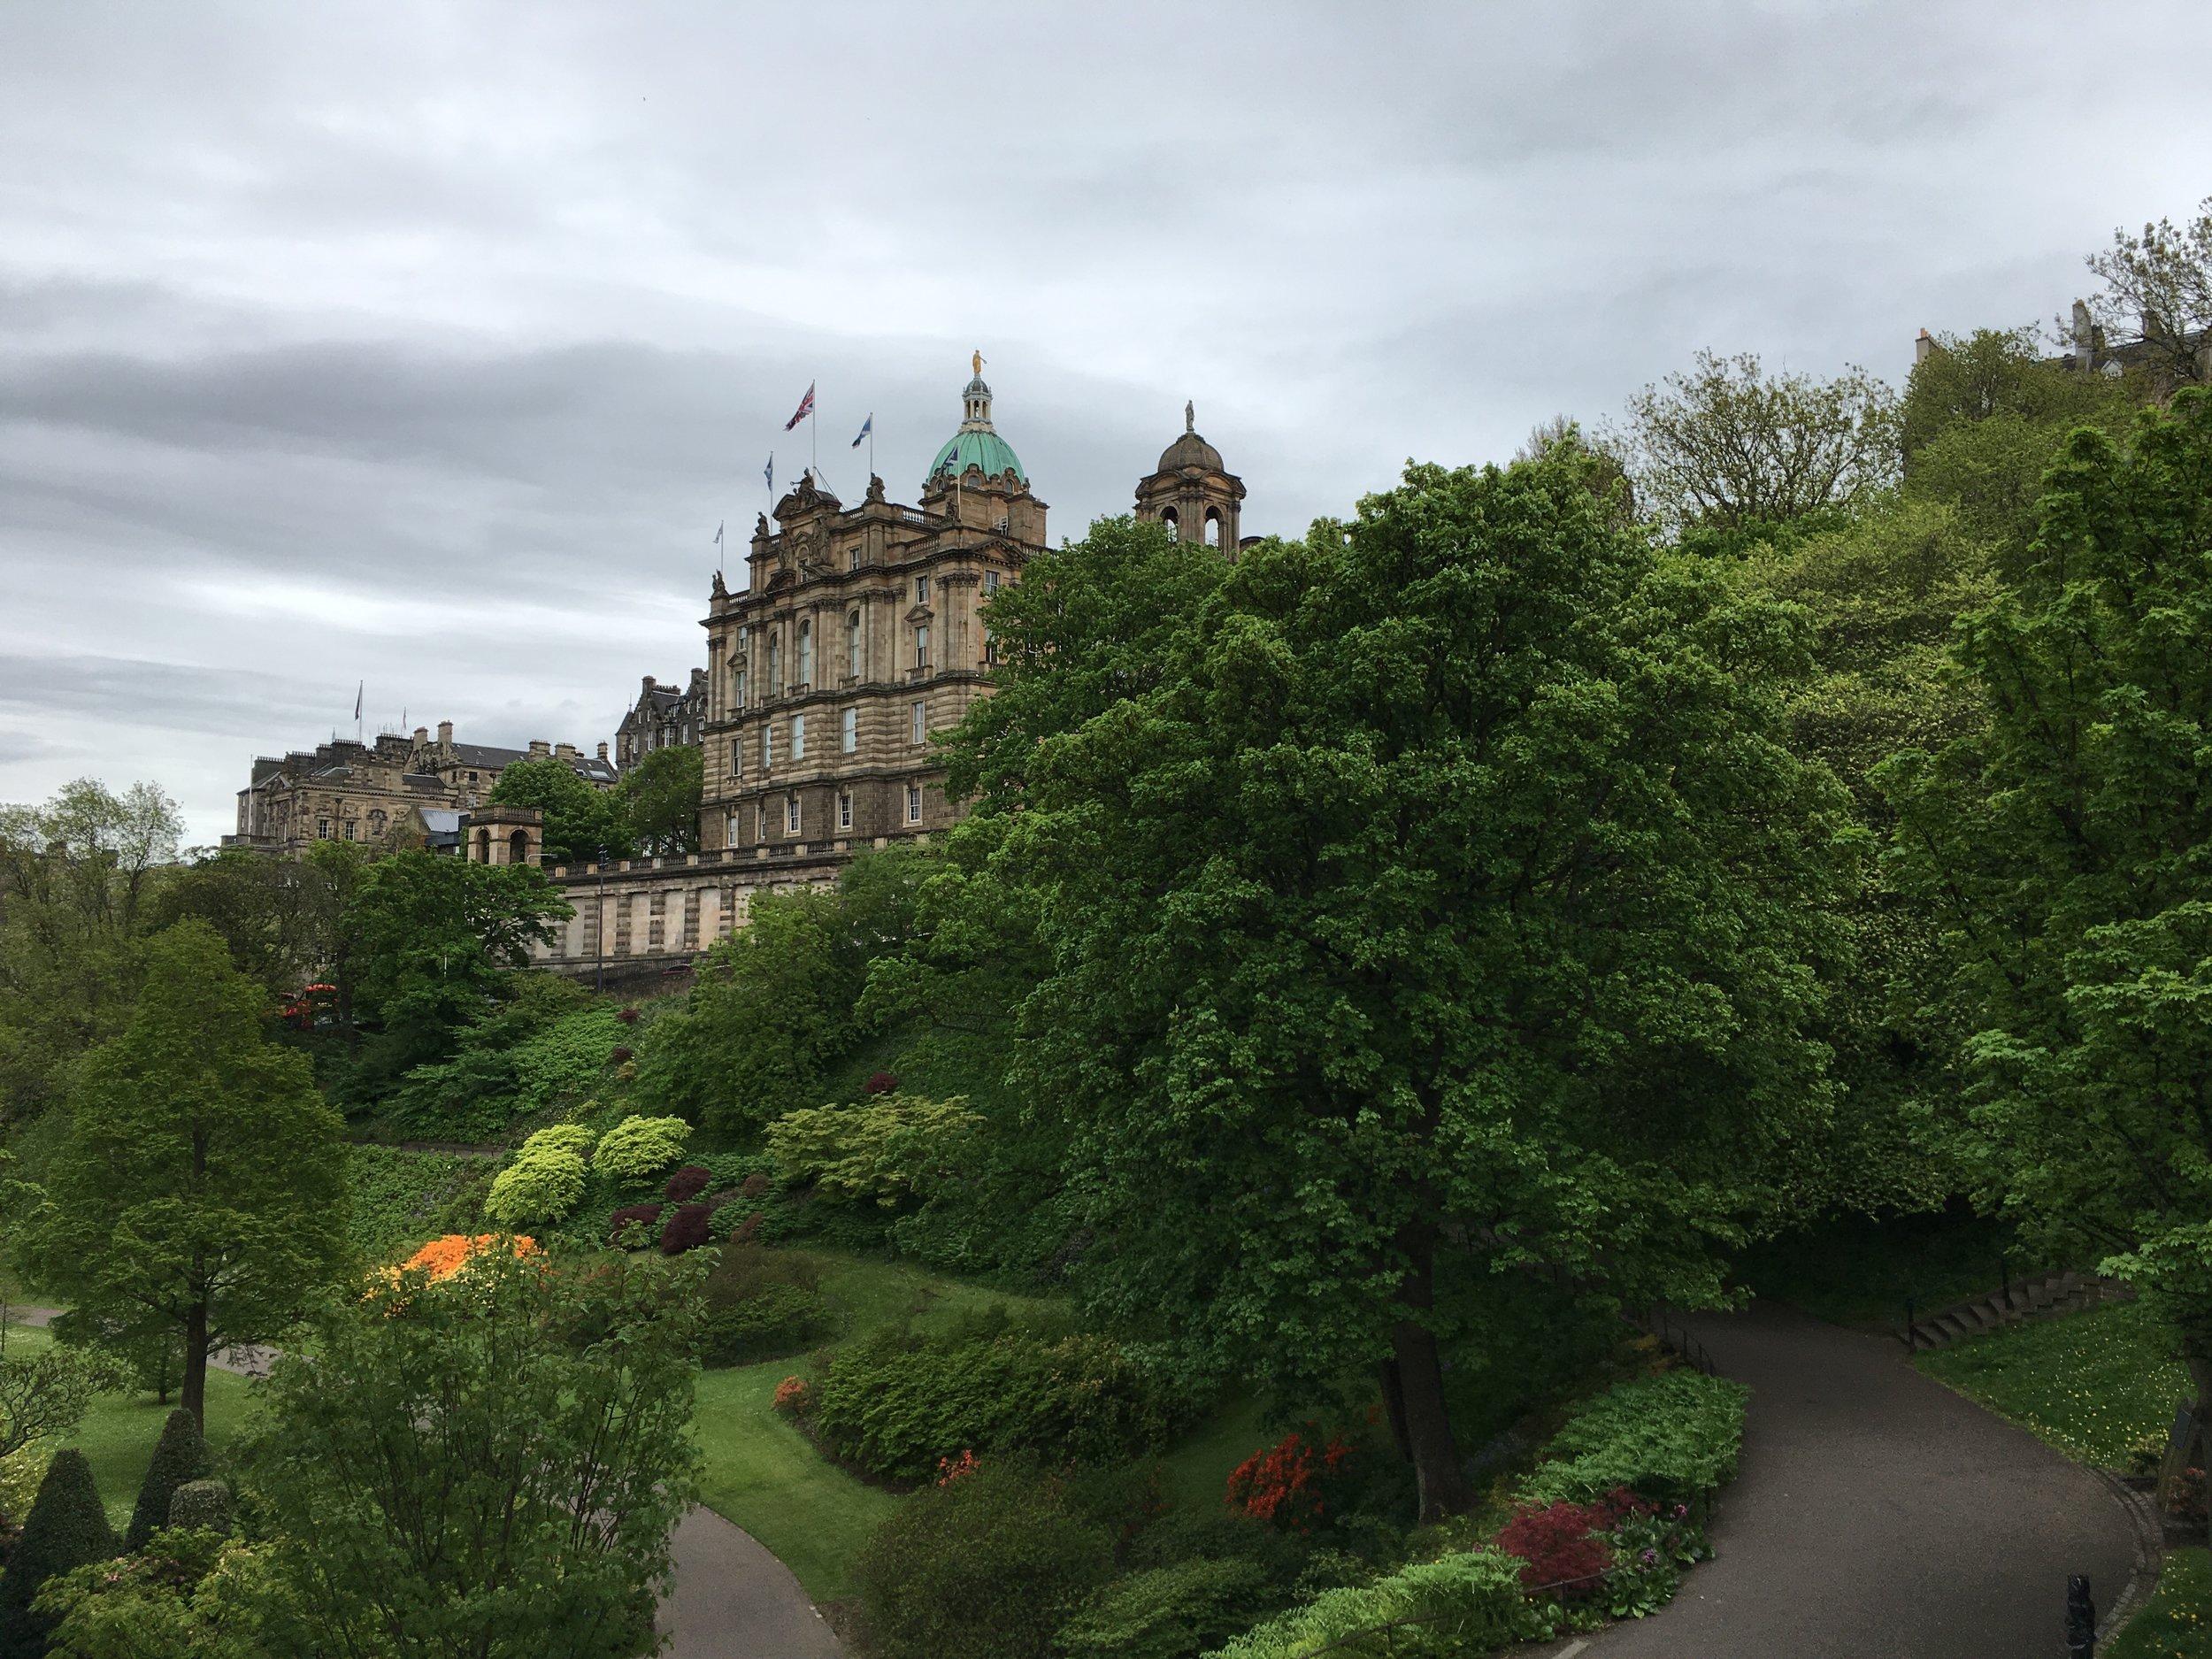 Prince Street Gardens